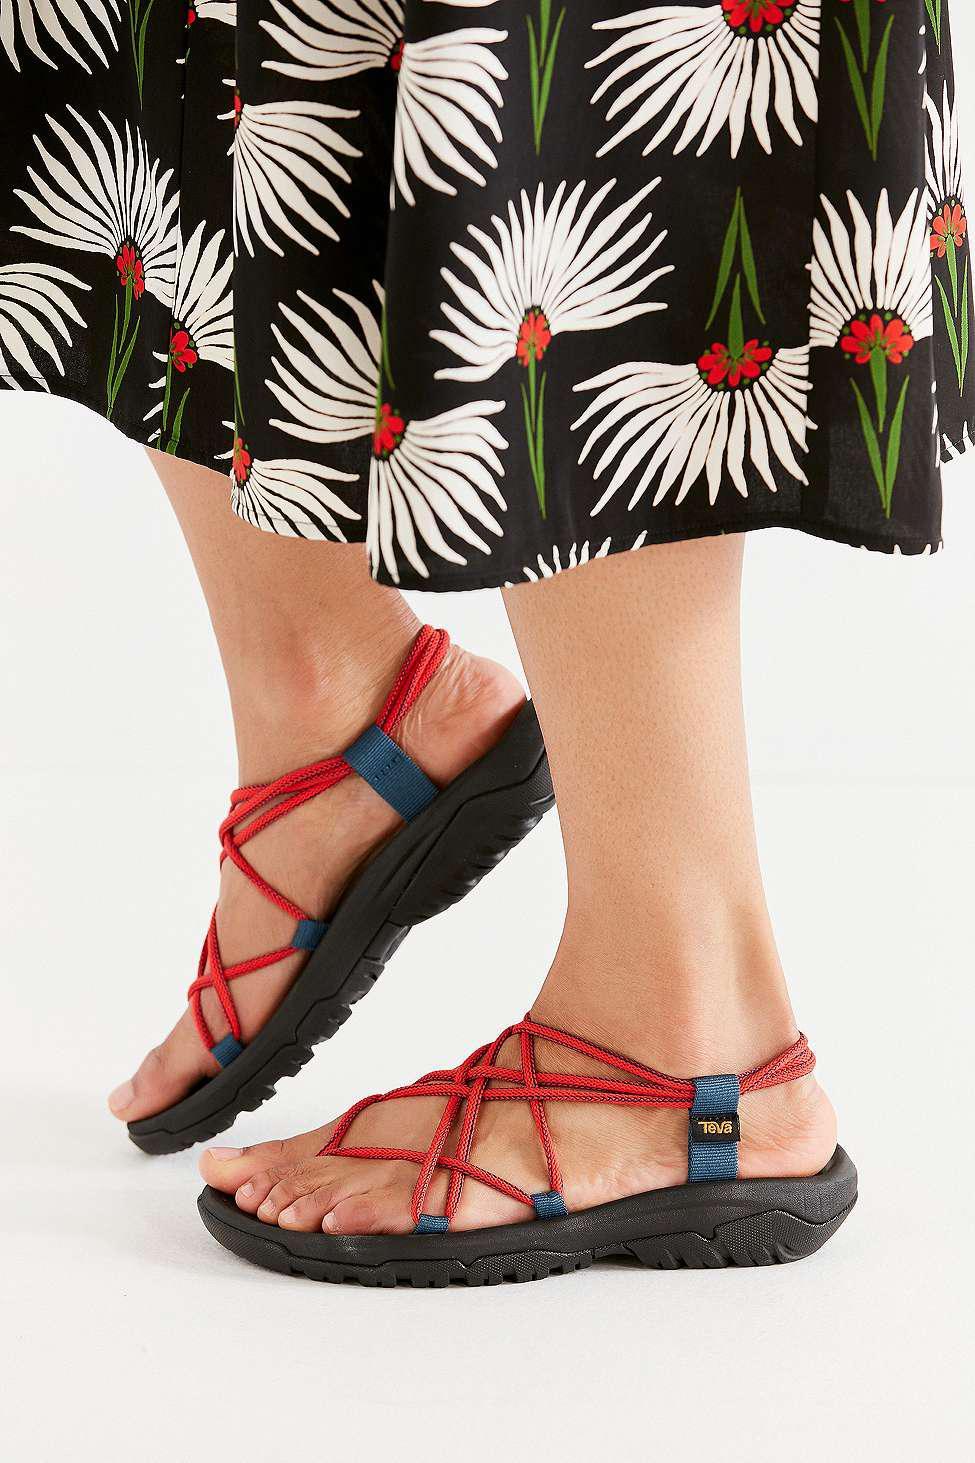 2dc6dc1742b4 Teva Hurricane Xlt Infinity Red Sandals - Womens Uk 8 in Red - Lyst